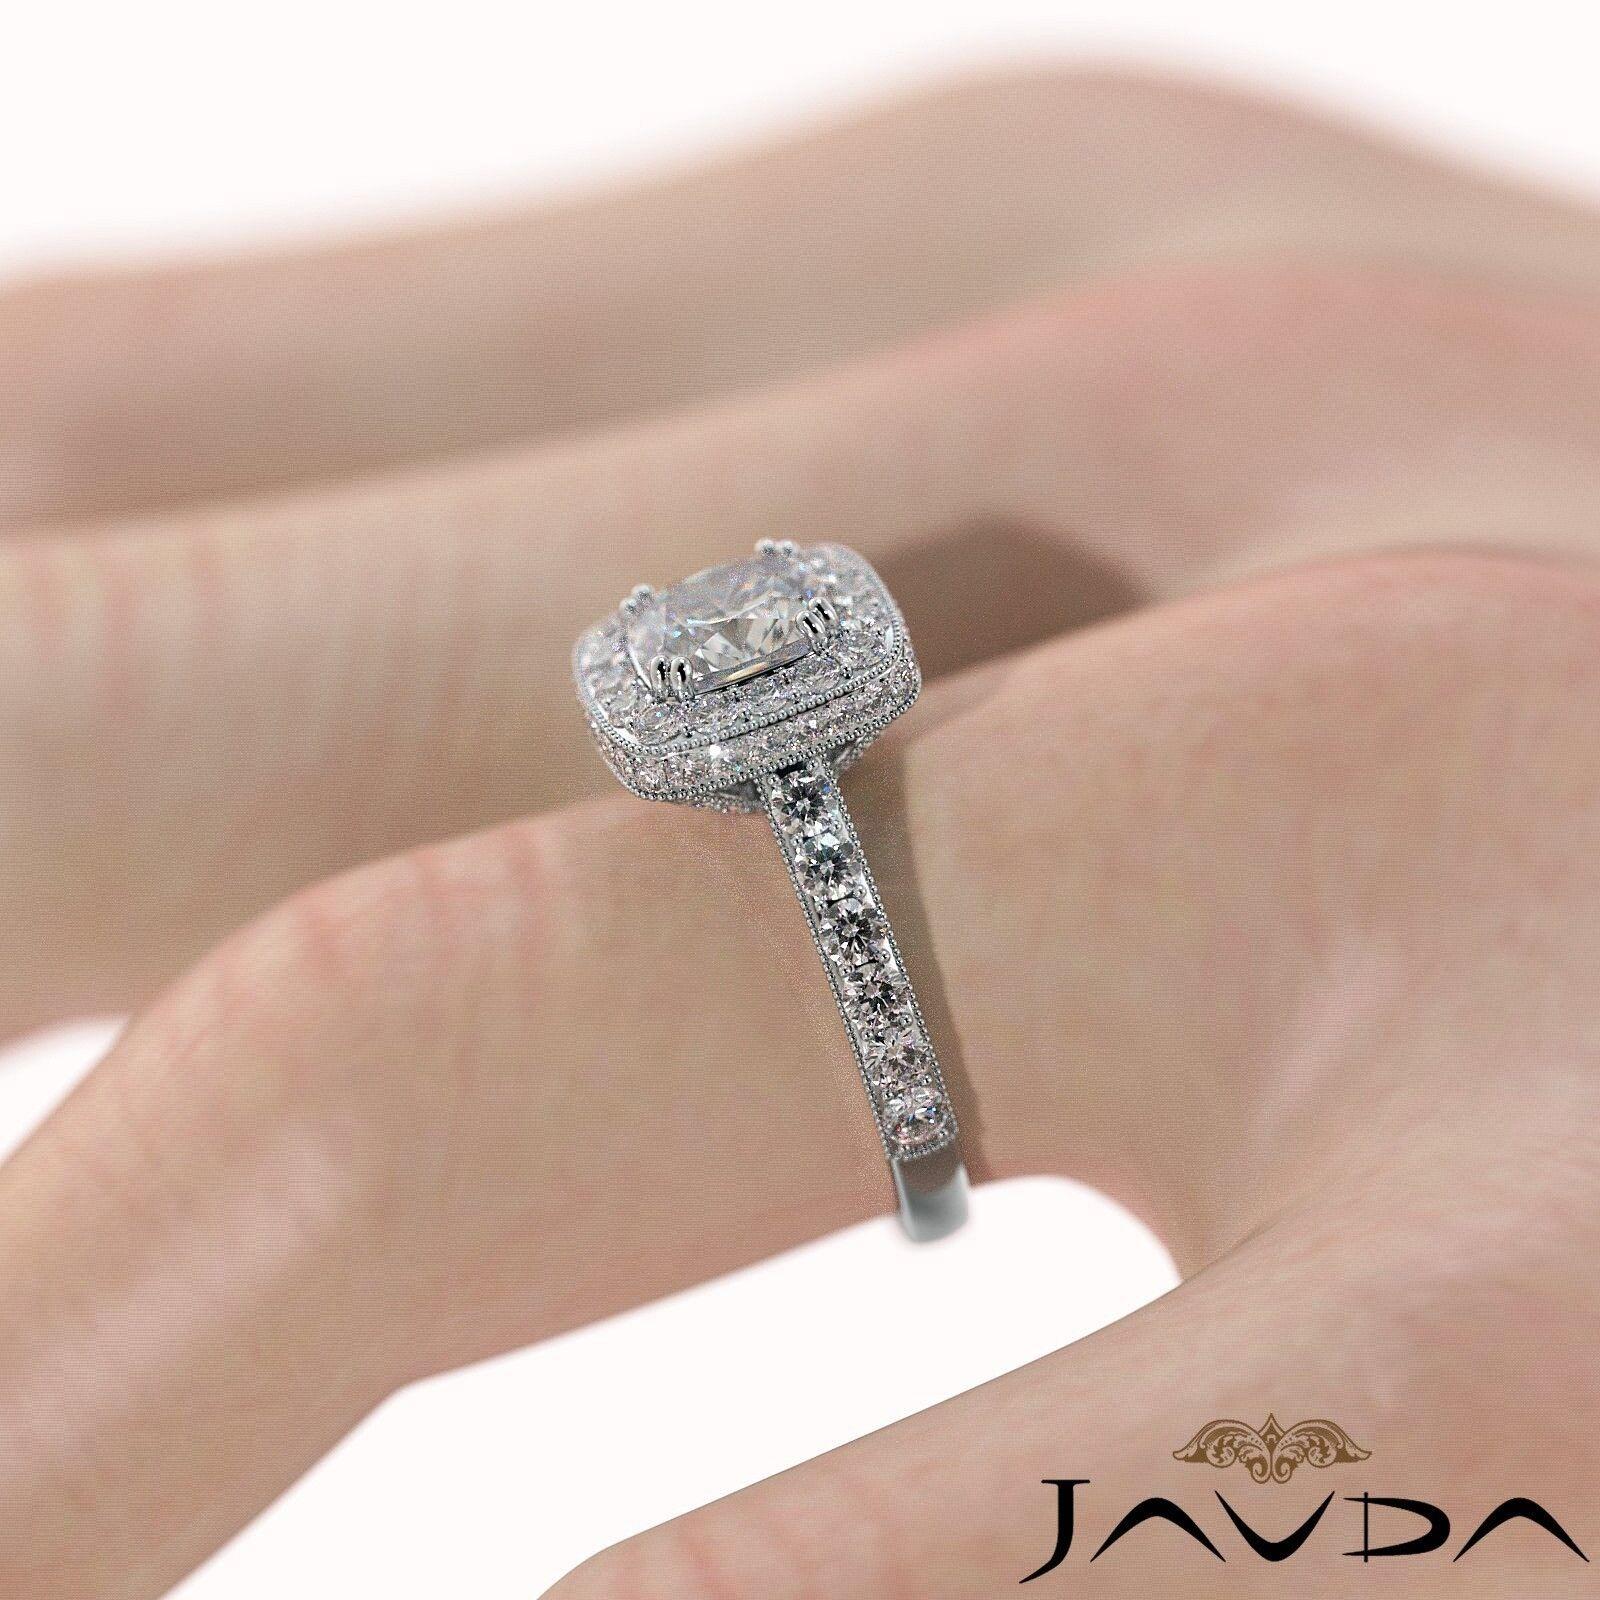 2ctw Milgrain Halo Floral Basket Cushion Diamond Engagement Ring GIA H-VS2 Gold 5